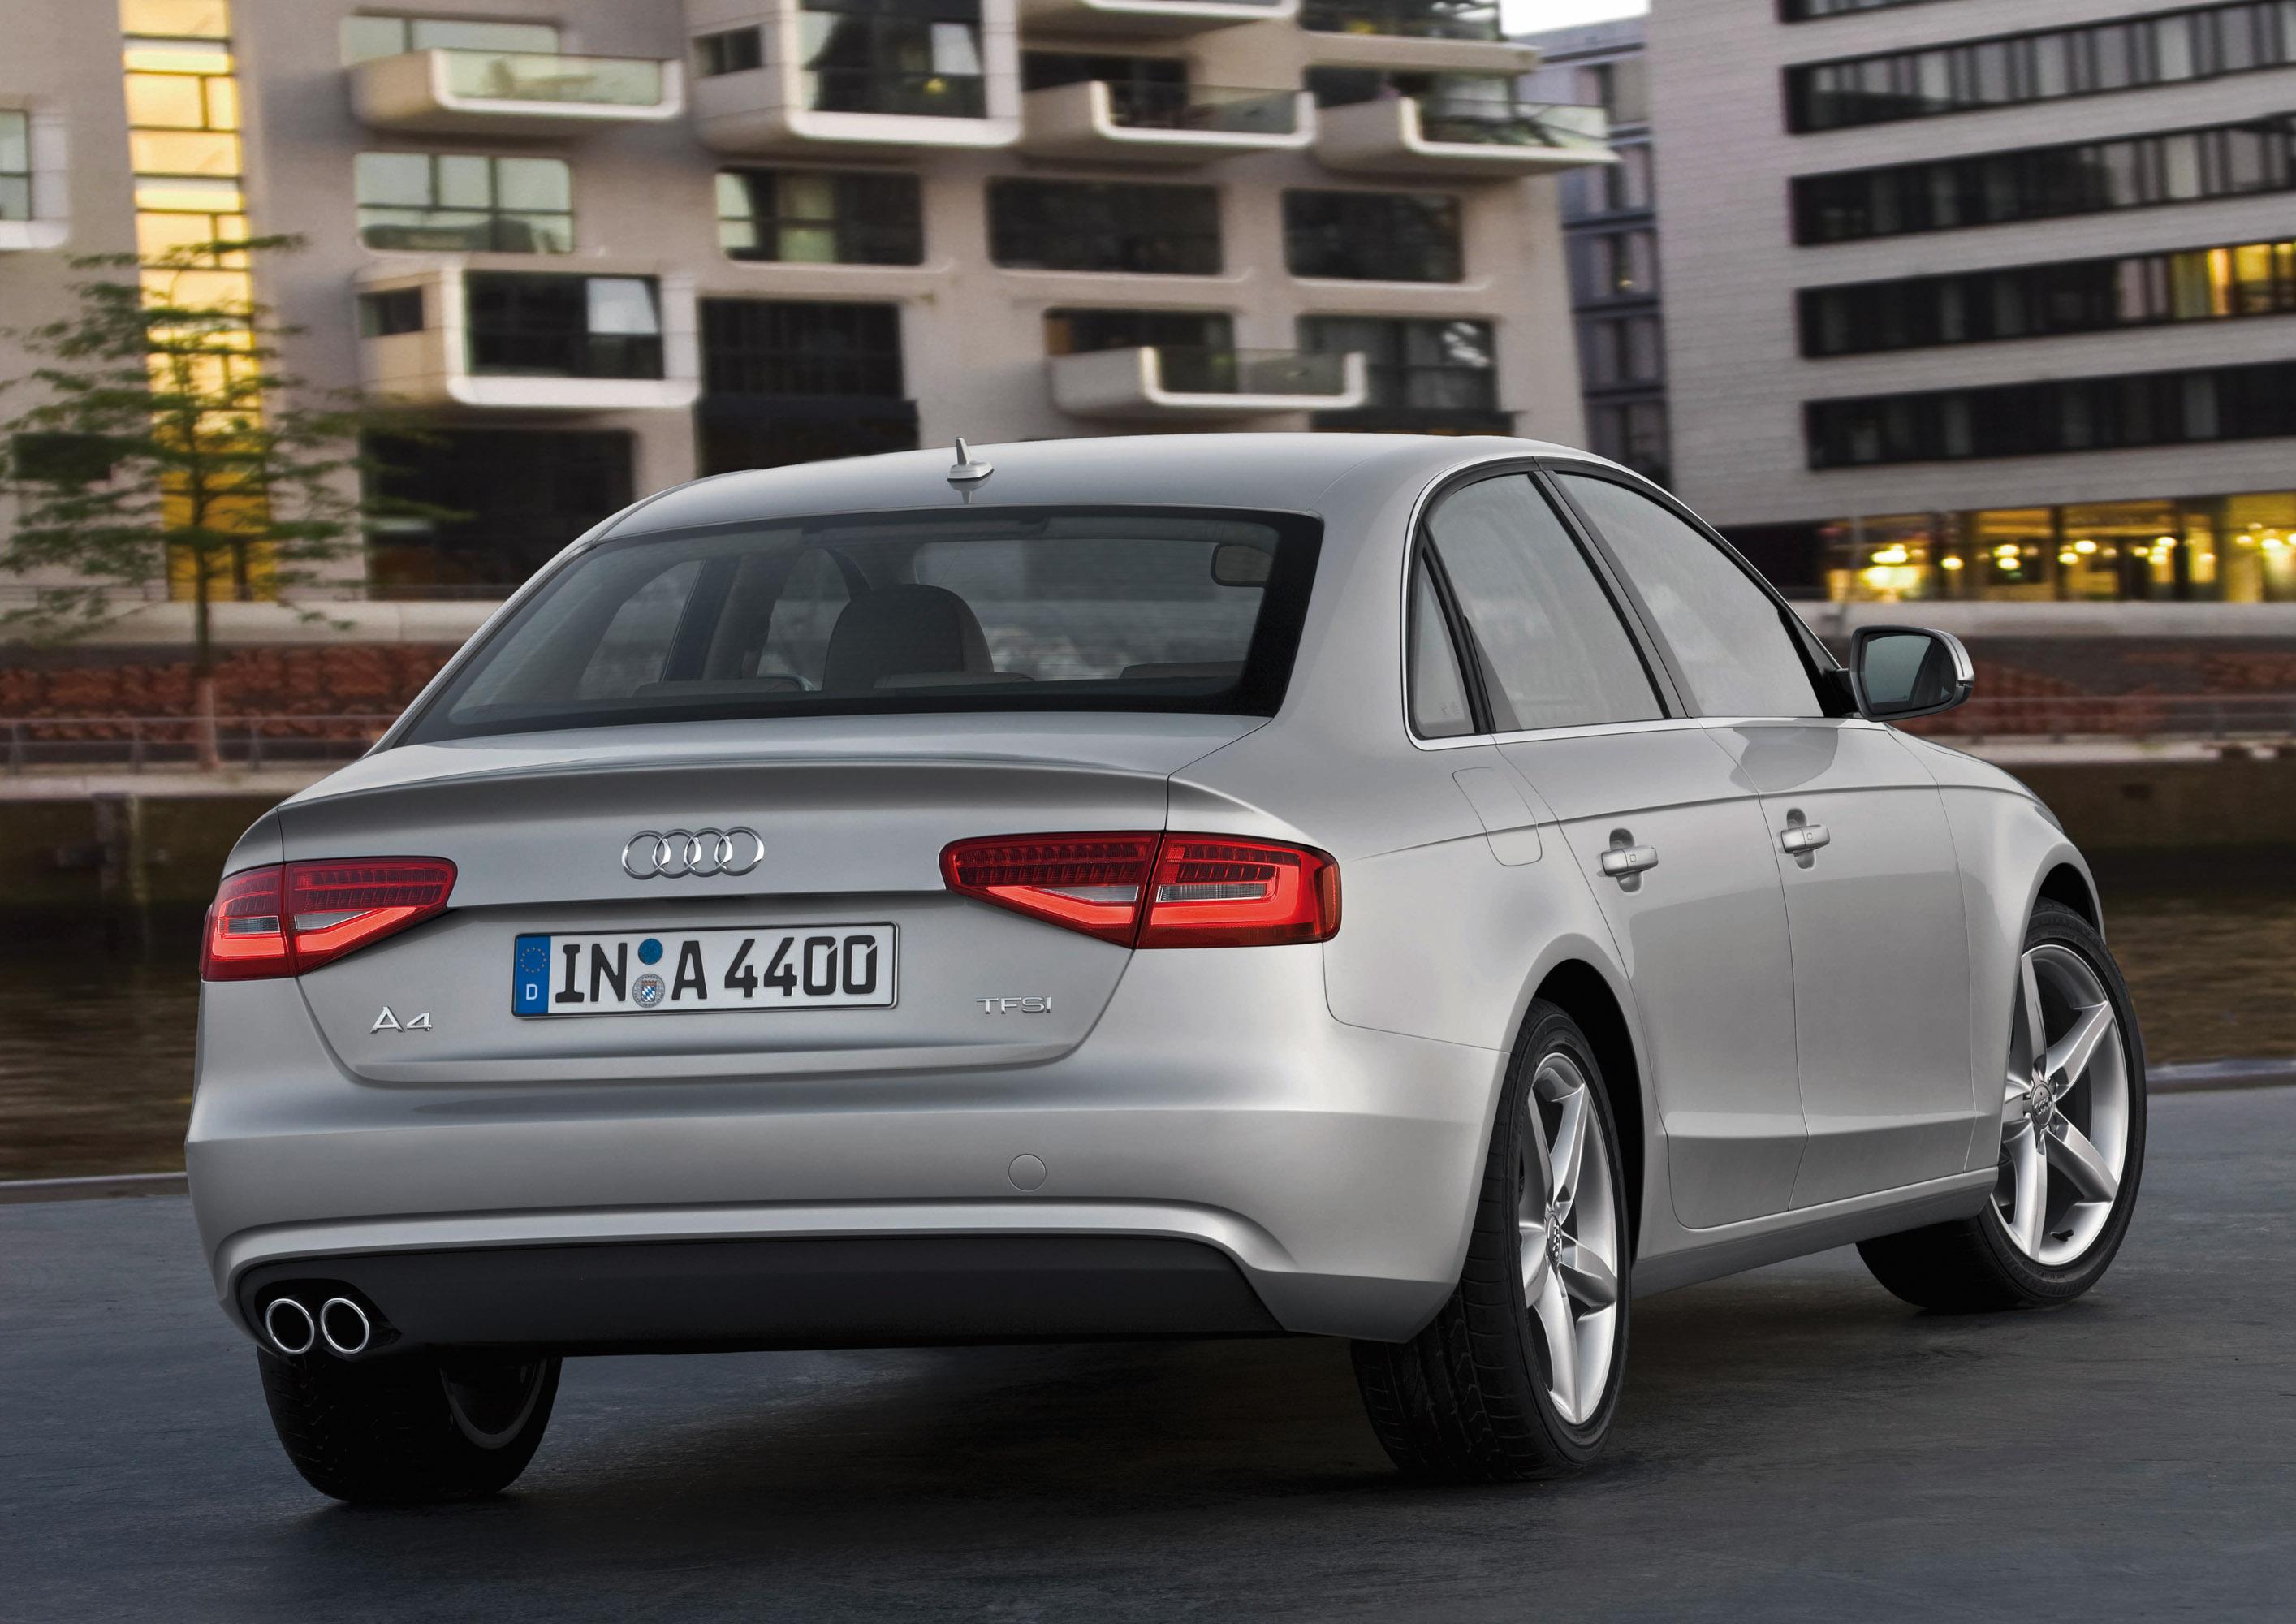 2012 Audi A4 Picture 59941